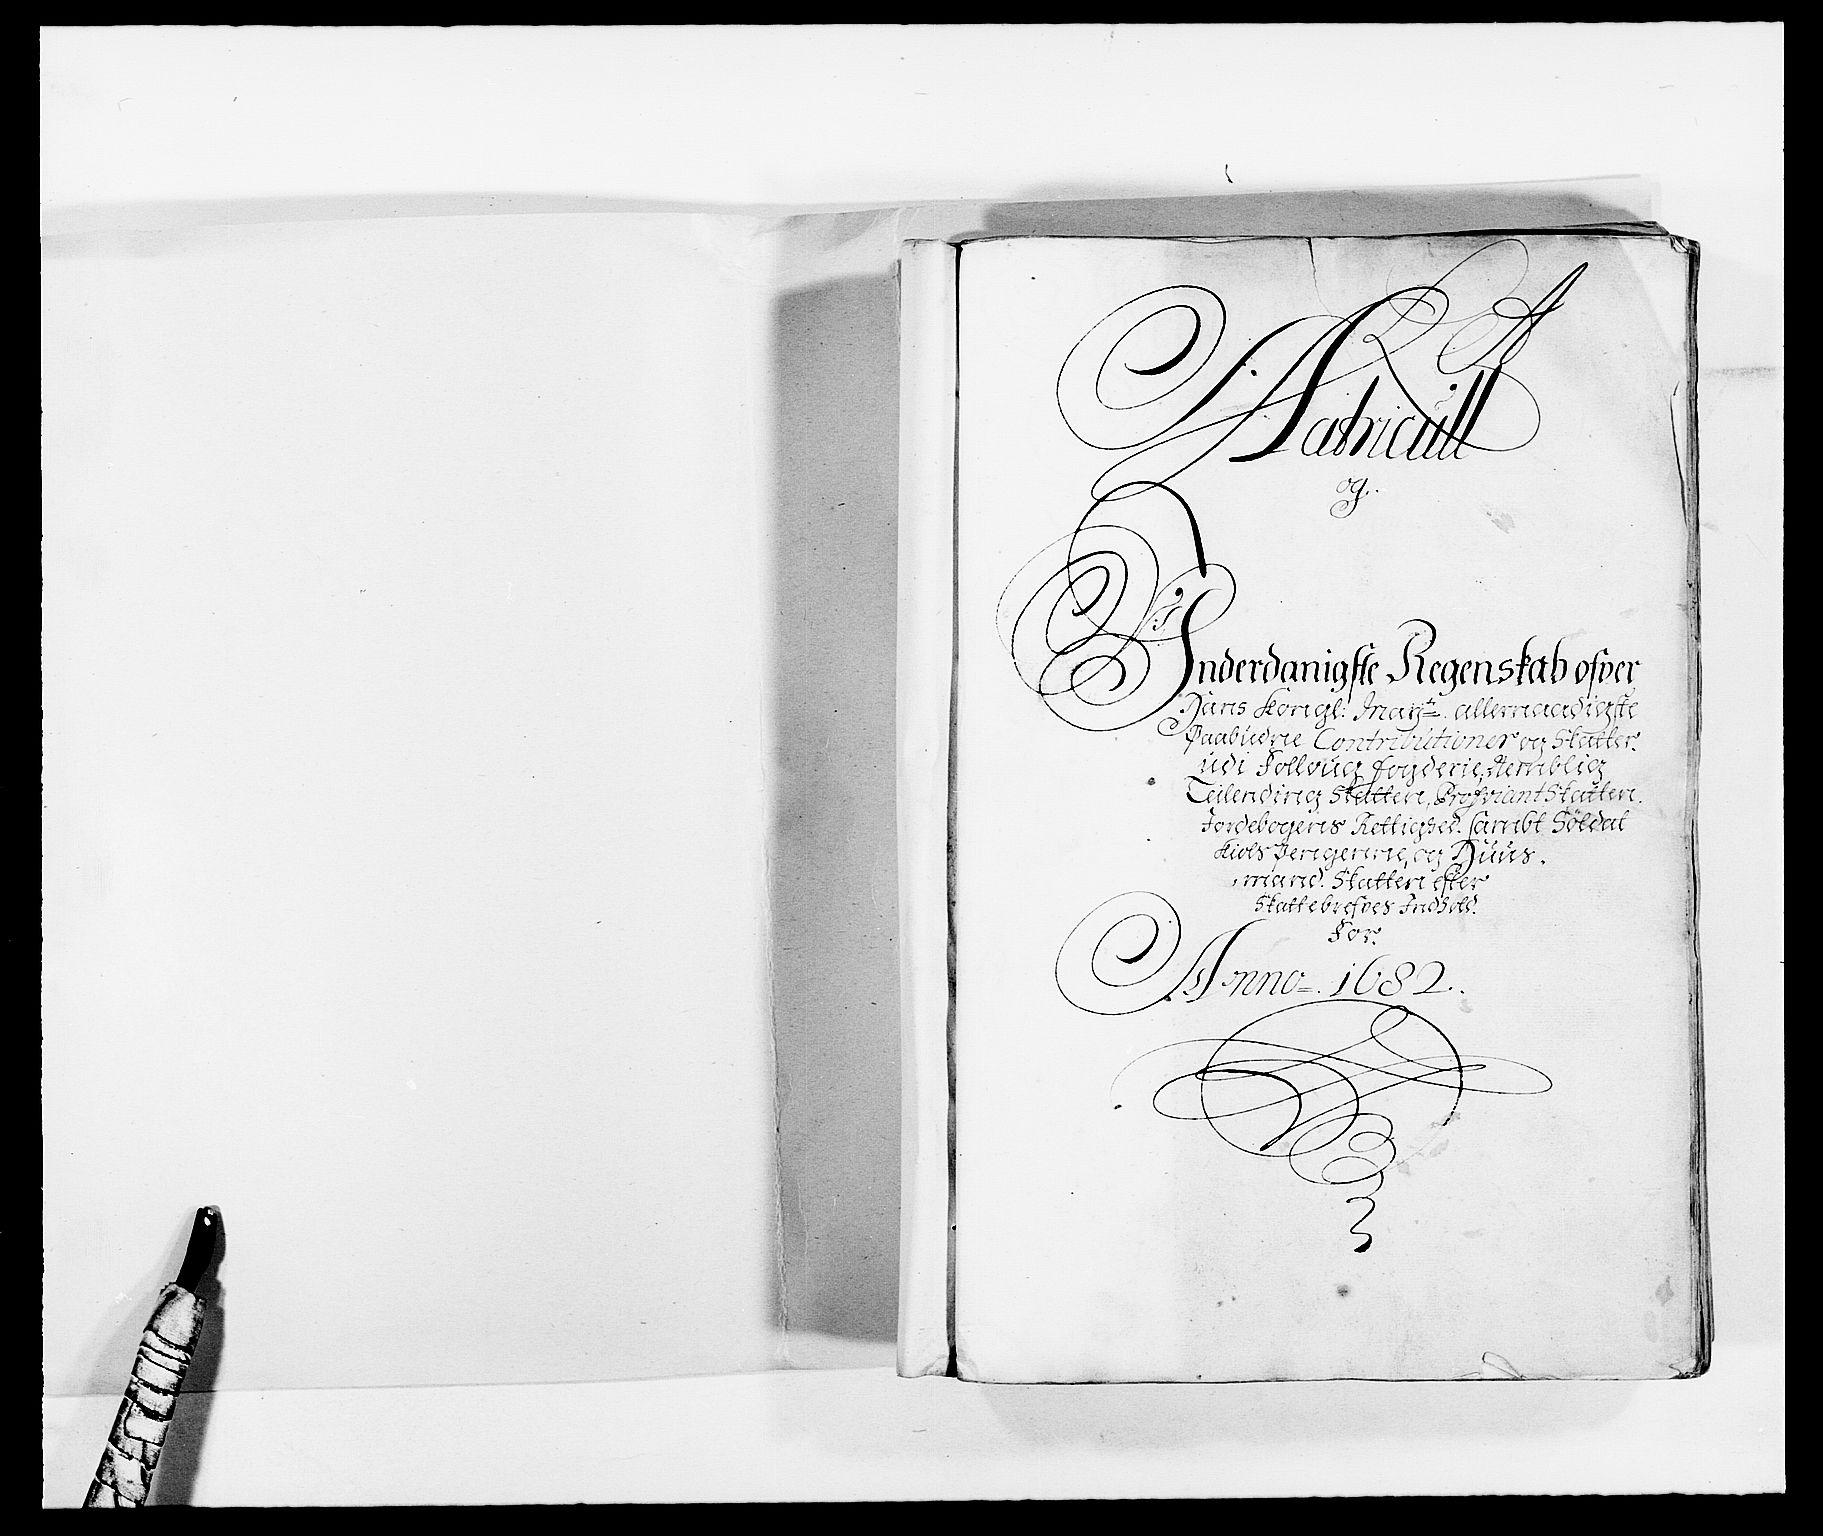 RA, Rentekammeret inntil 1814, Reviderte regnskaper, Fogderegnskap, R09/L0430: Fogderegnskap Follo, 1682-1683, s. 2